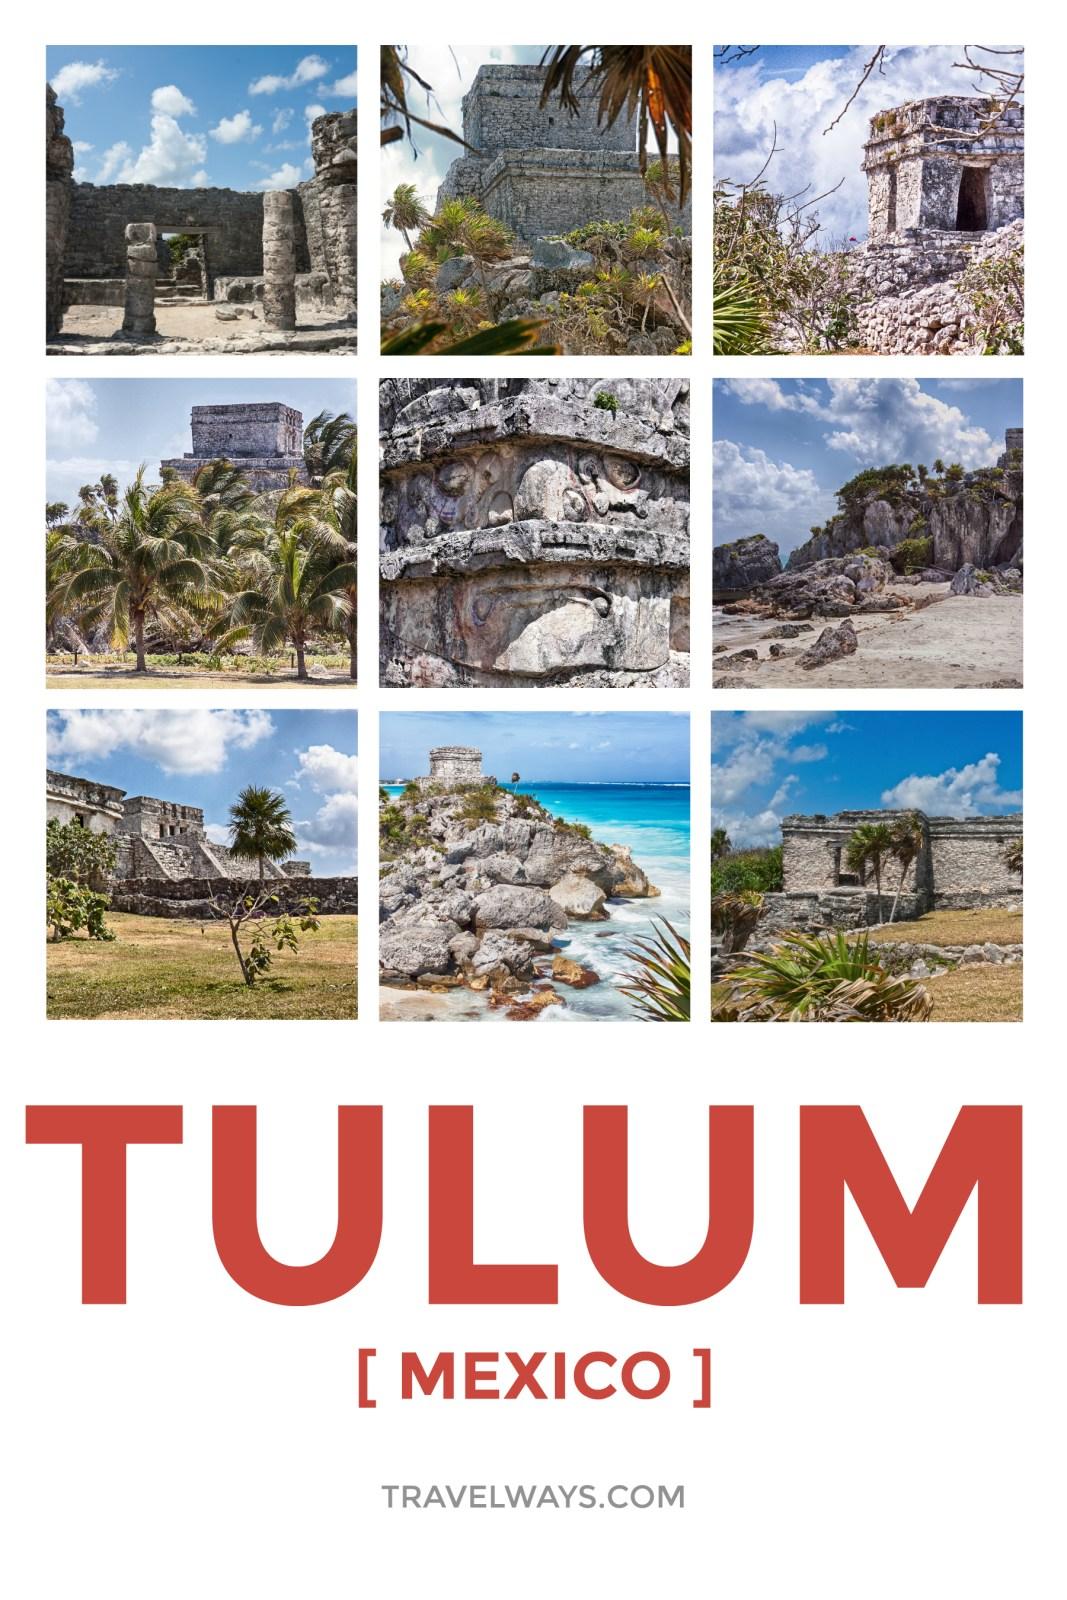 Tulum Mayan Site, Mexico